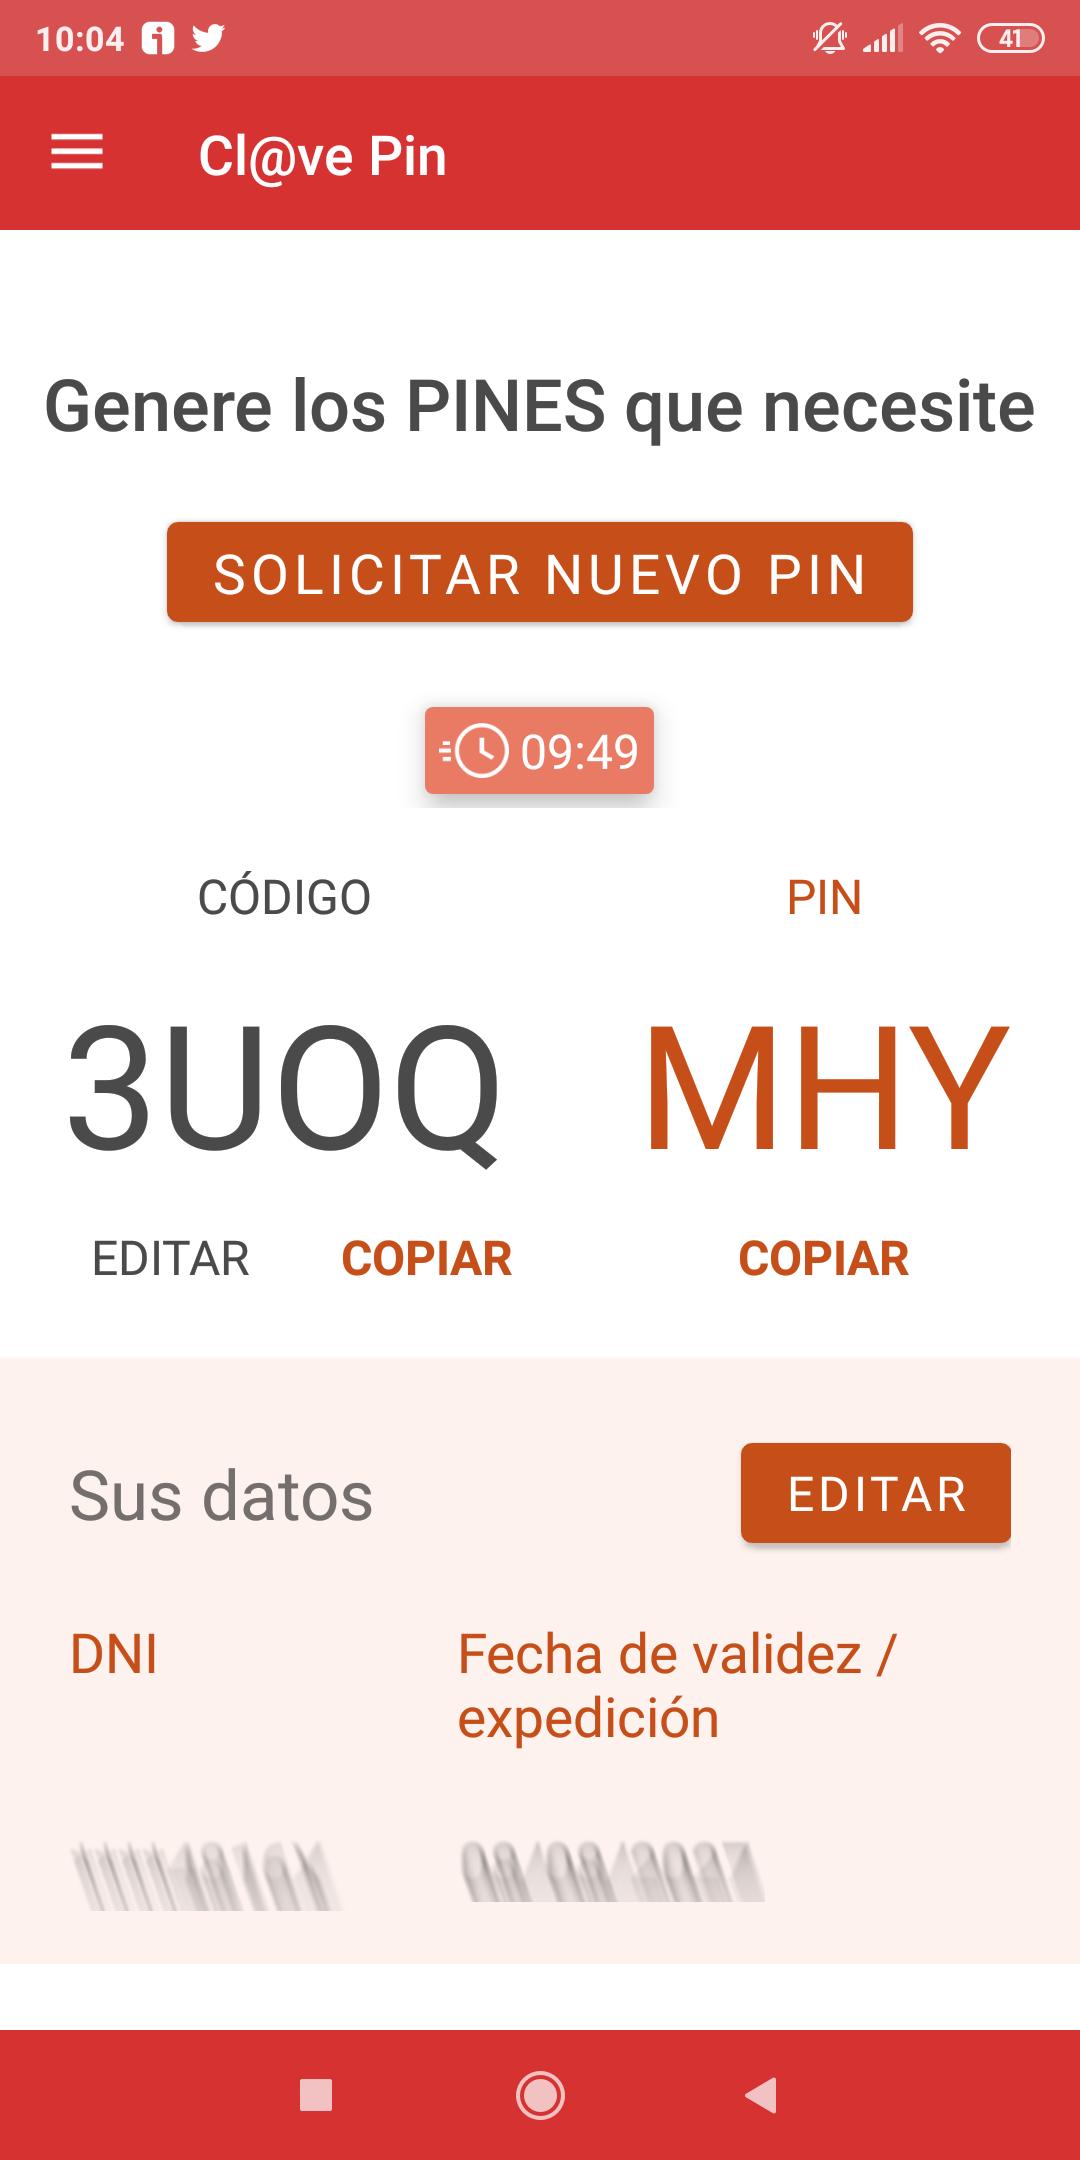 Captura de pantalla del aspecto de la APP Clave PIN